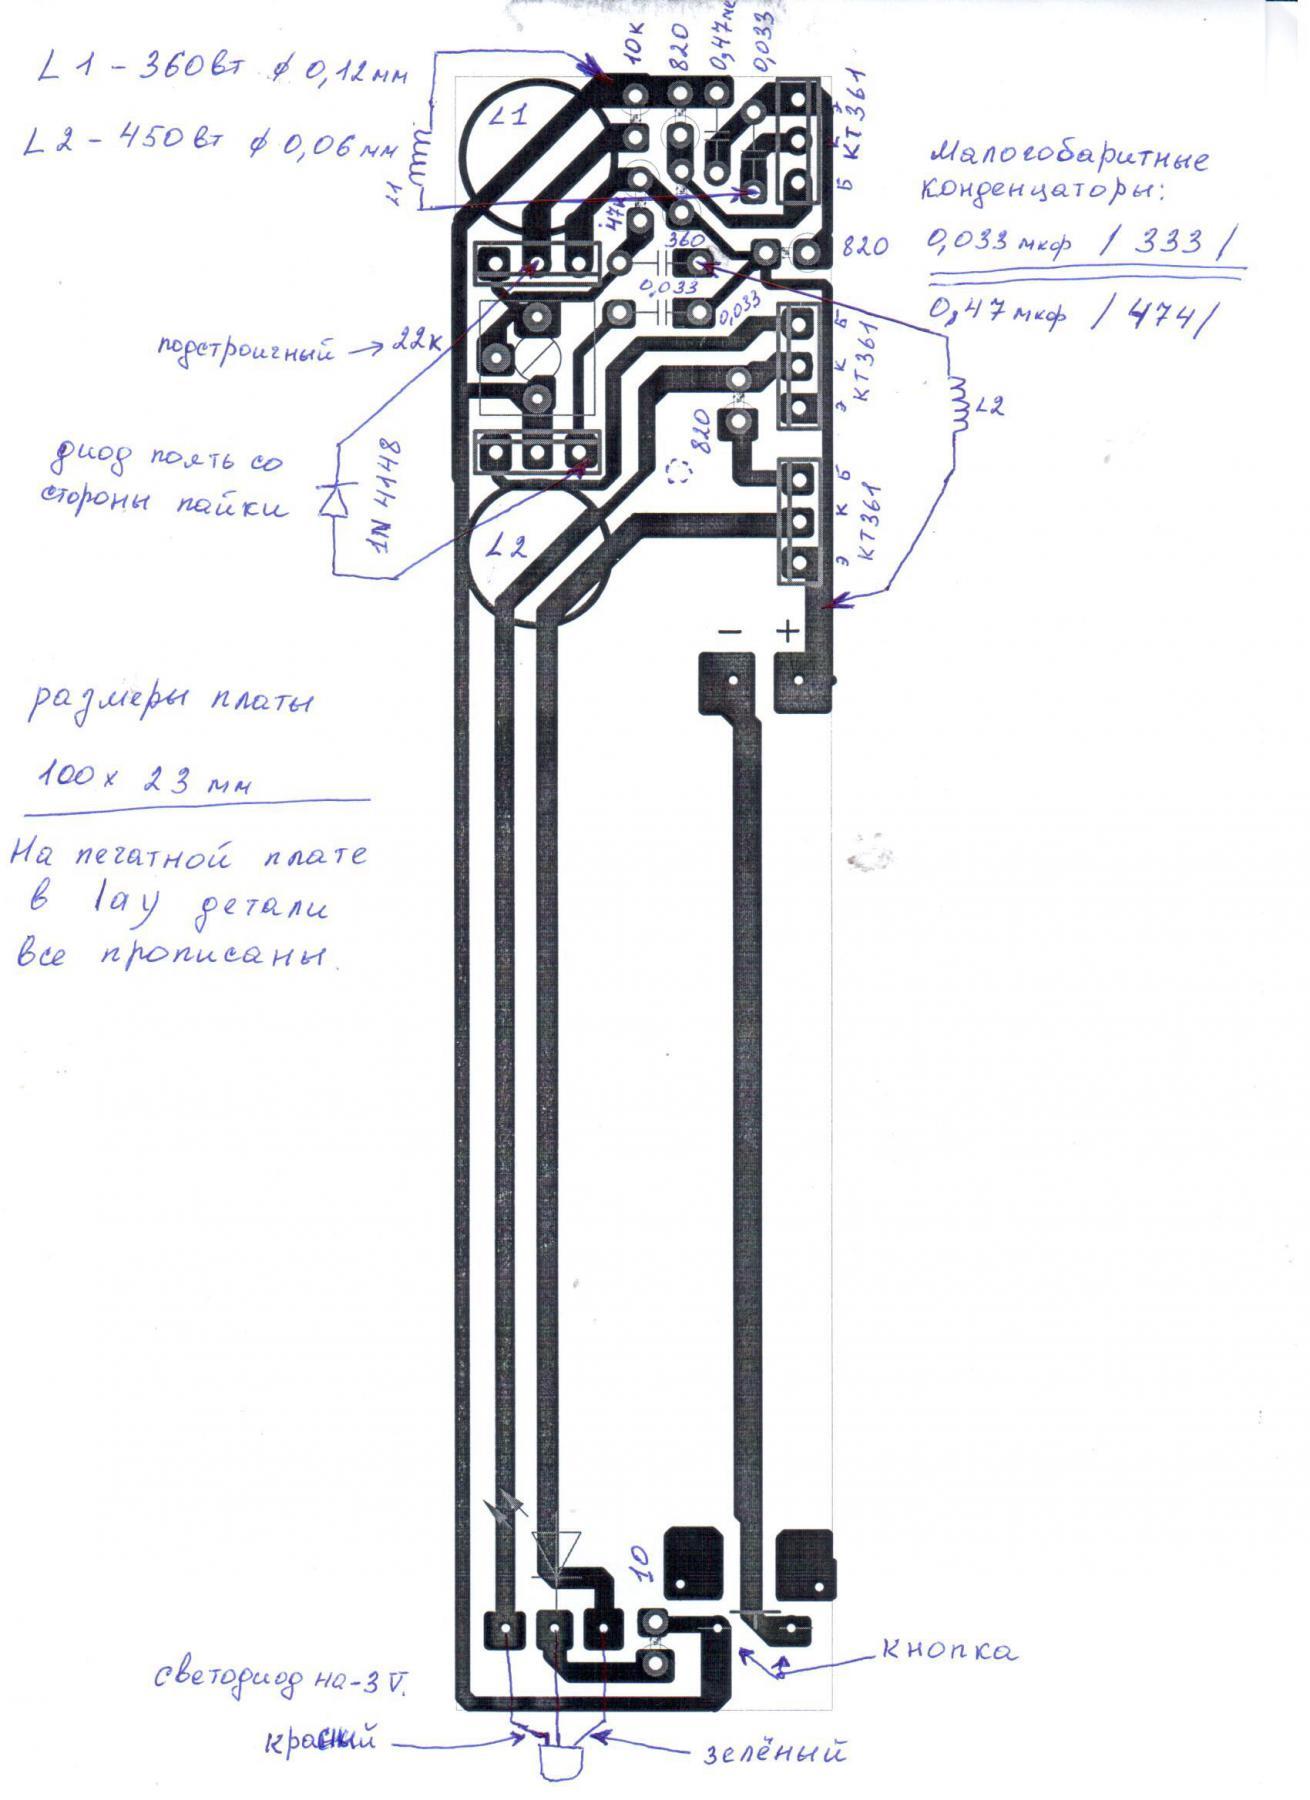 Схема прибора проверки якорей статоров